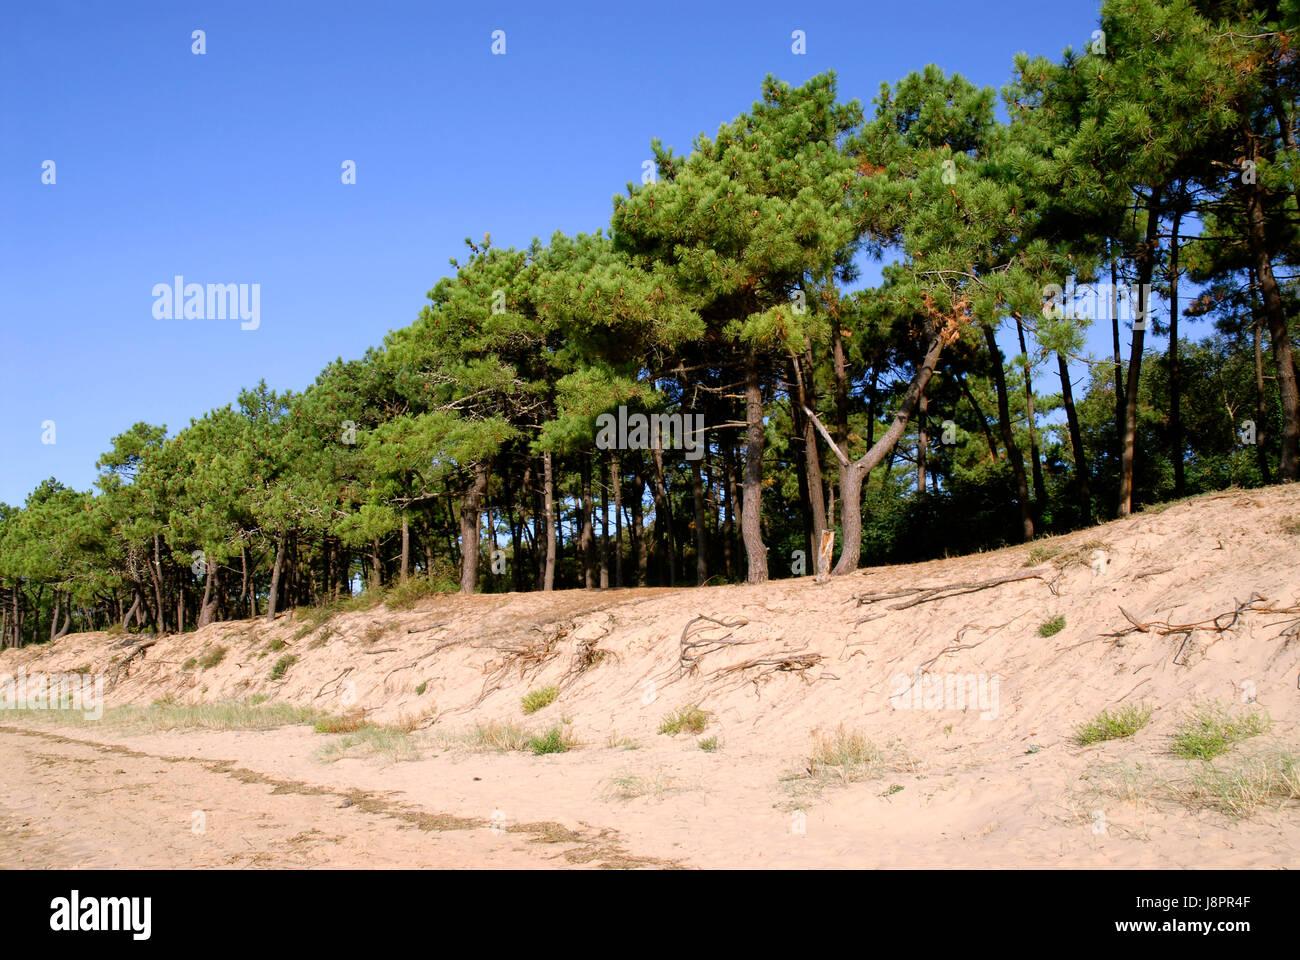 Baum kiefer frankreich nadelbaum d nen sand sand - Kiefer baum kaufen ...